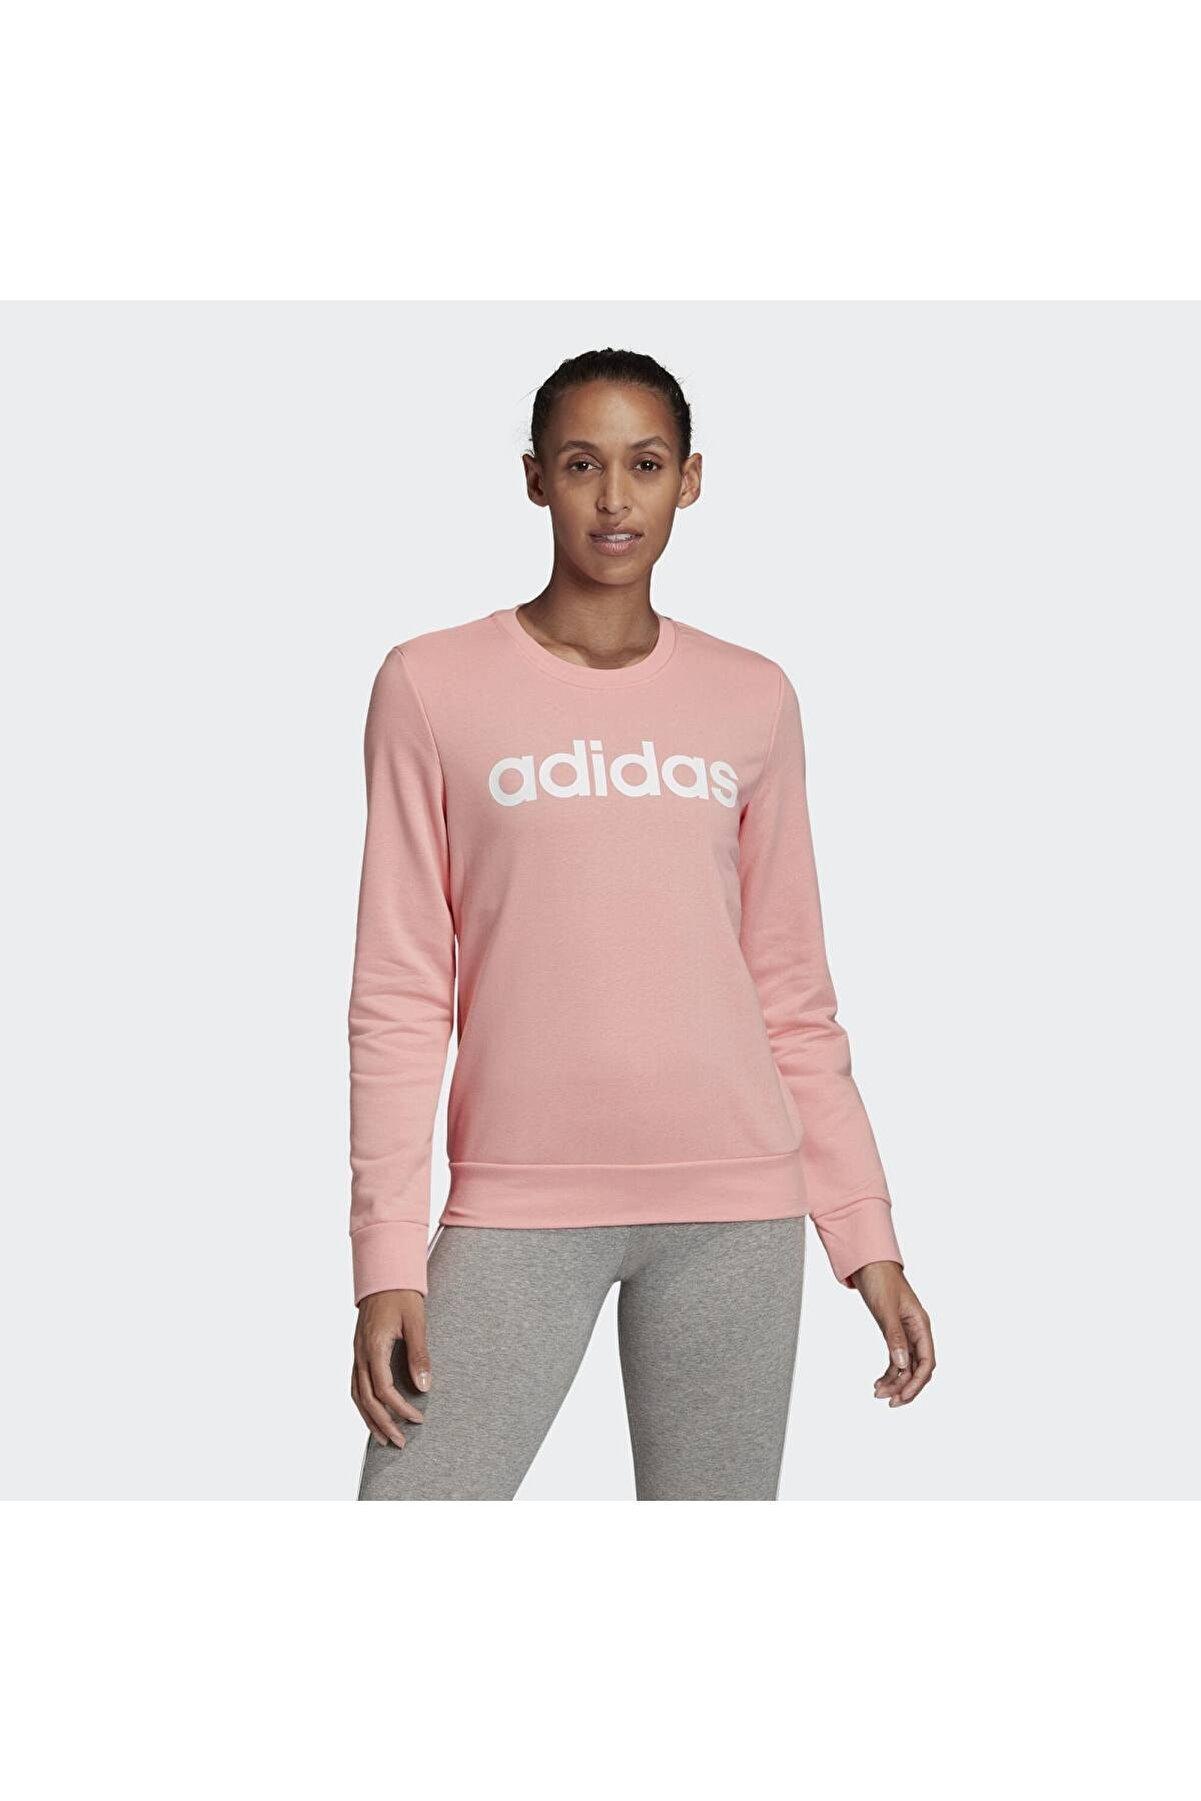 adidas W E LIN SWEAT Pembe Kadın Sweatshirt 100547738